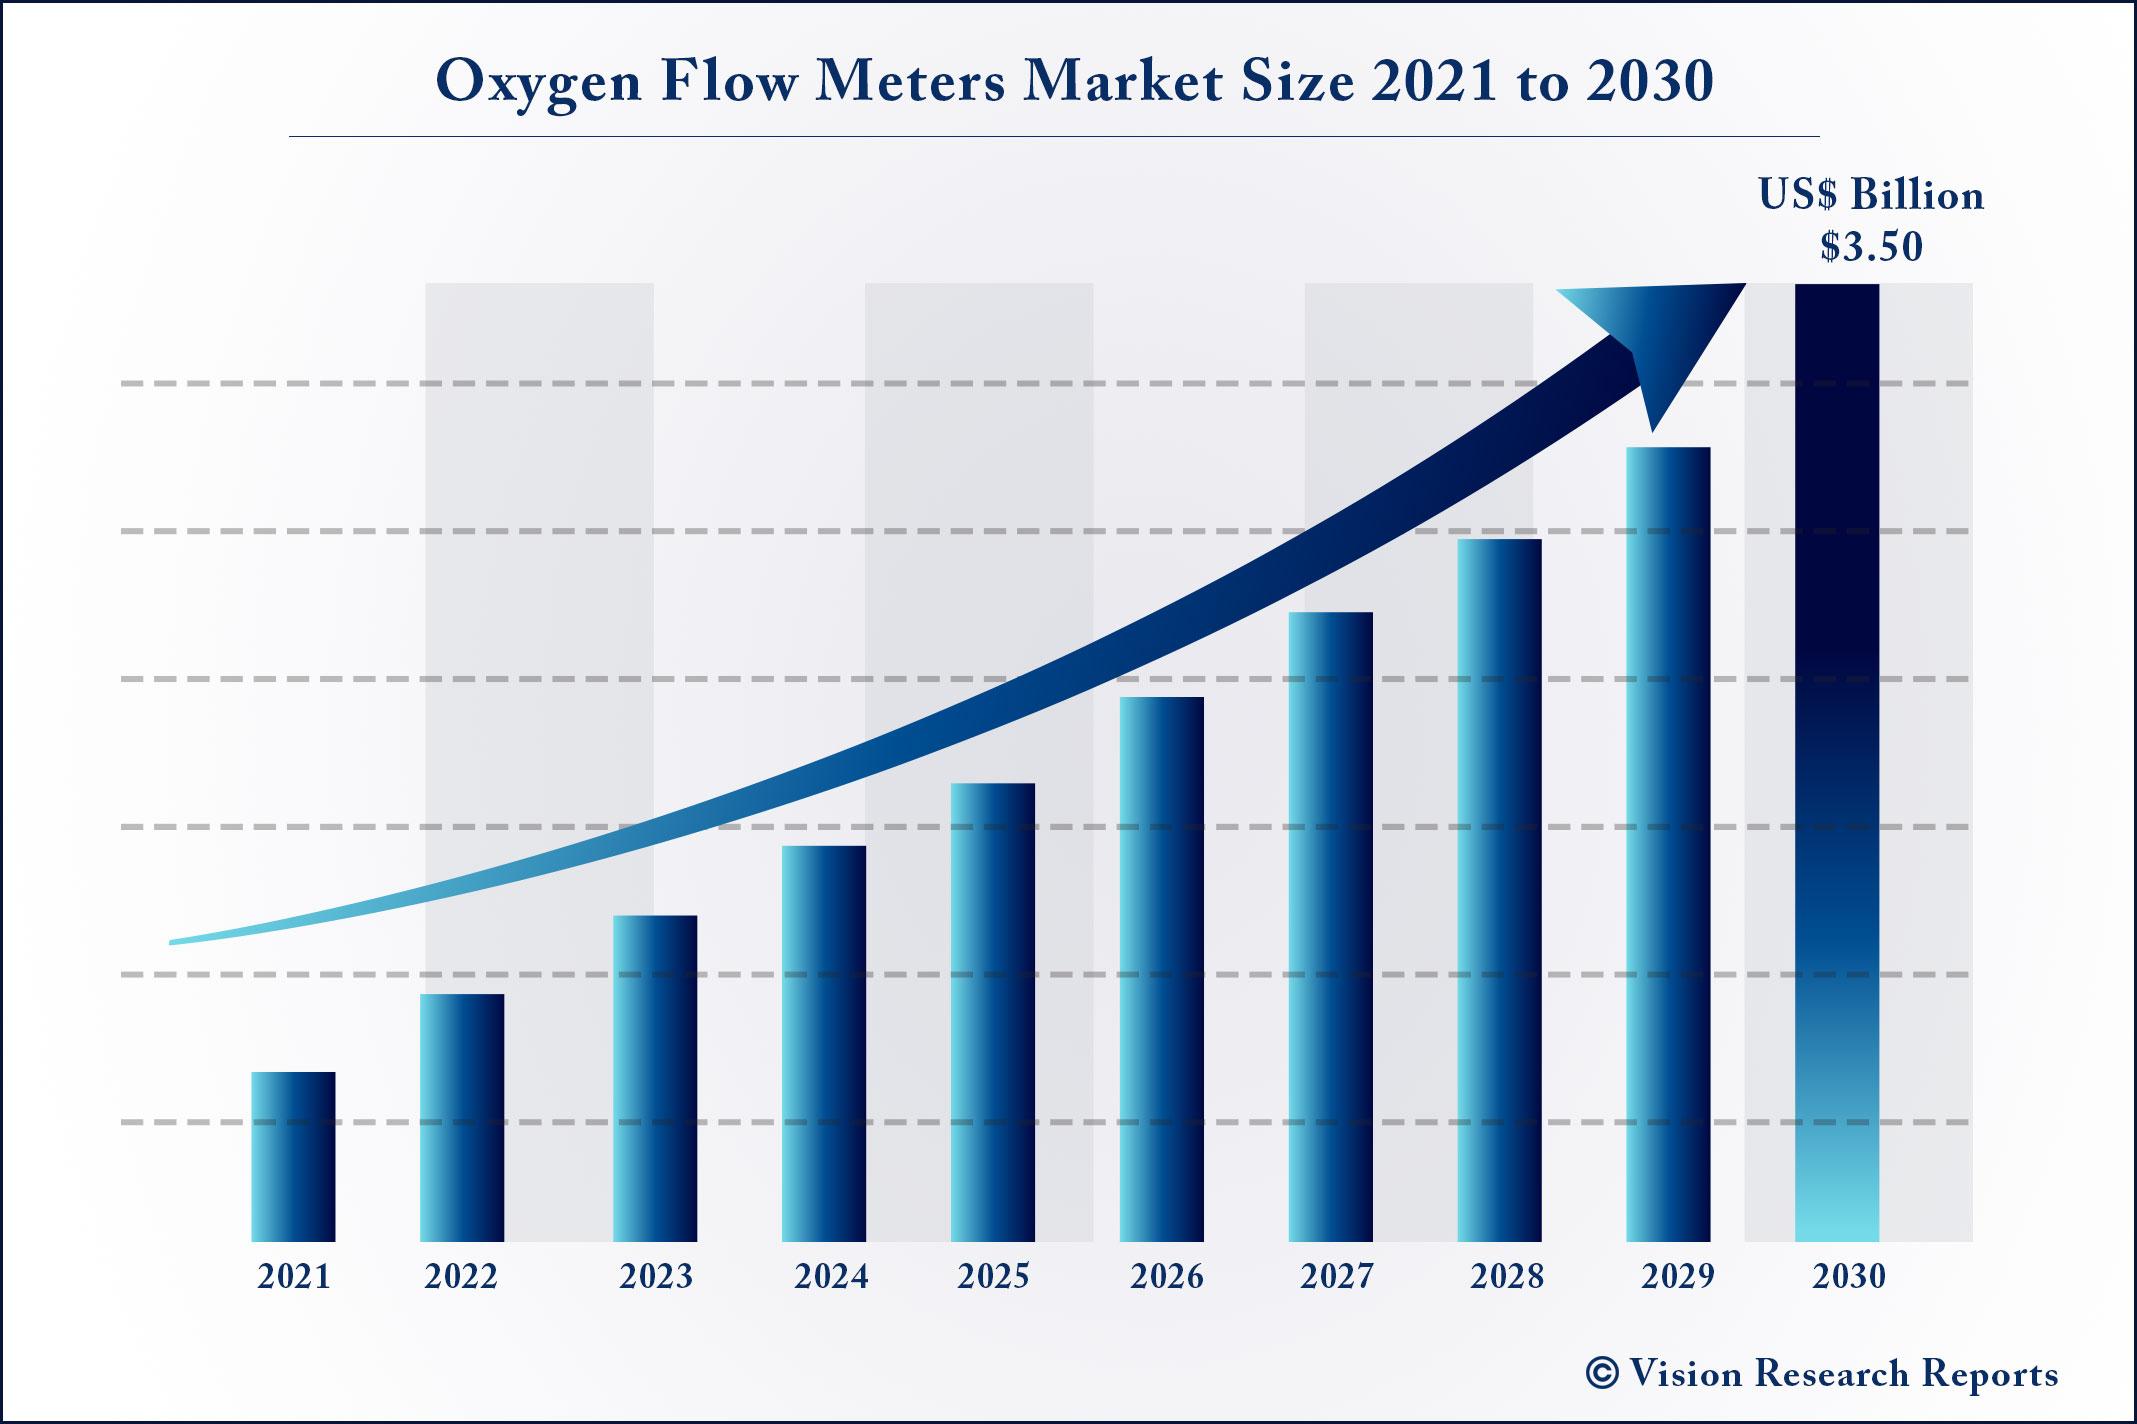 Oxygen Flow Meters Market Size 2021 to 2030